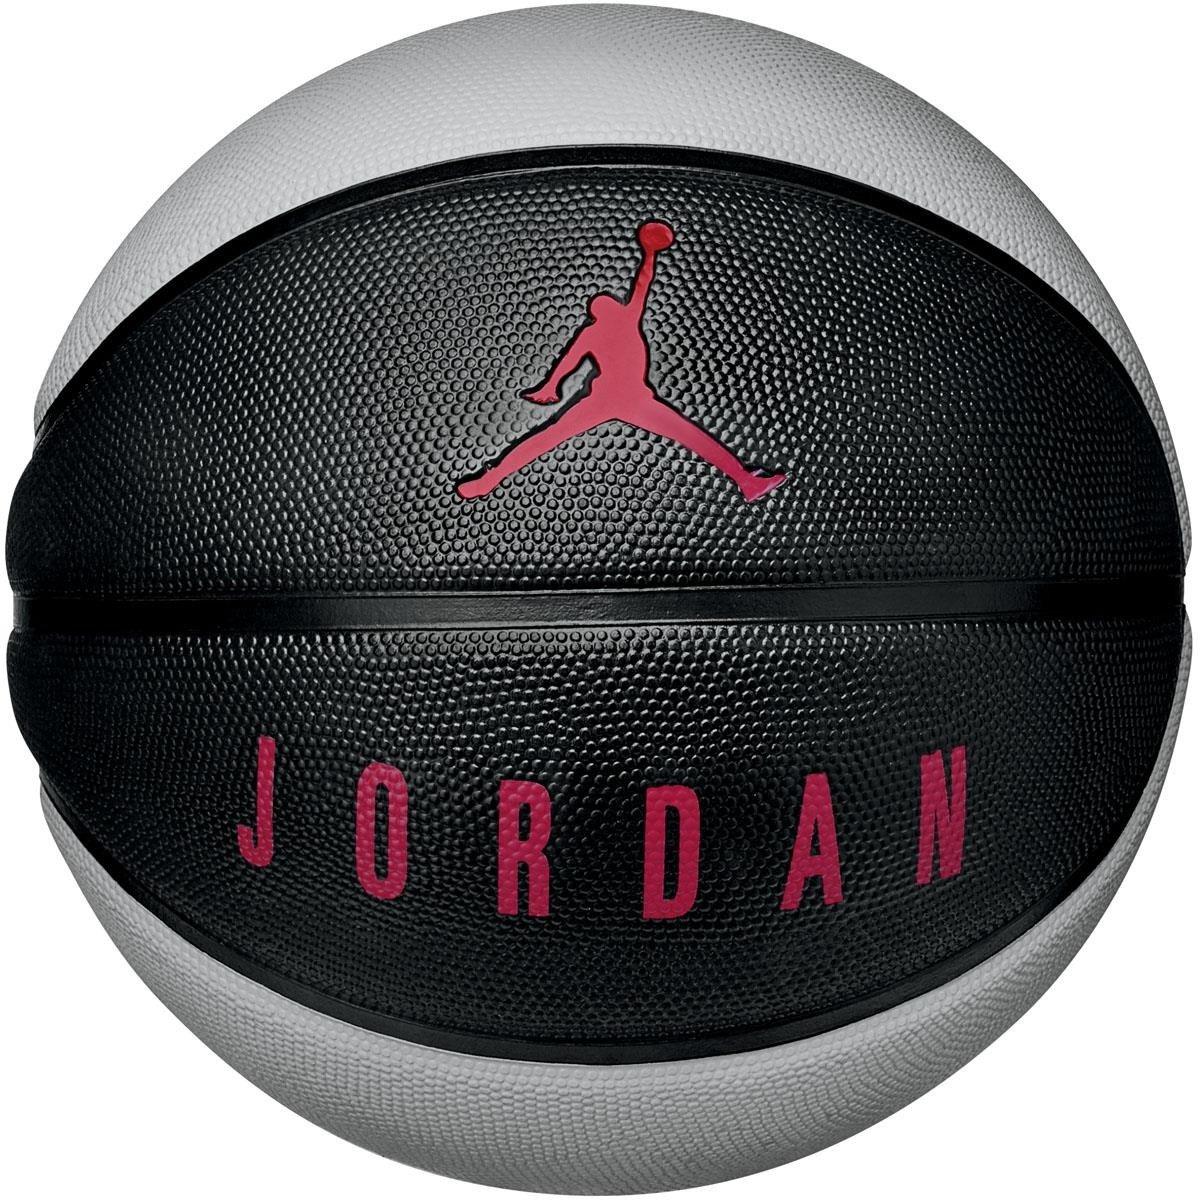 e47a5d4437384a Piłka do koszykówki Jordan Playground 8P - J000186504107 - Basketo.pl